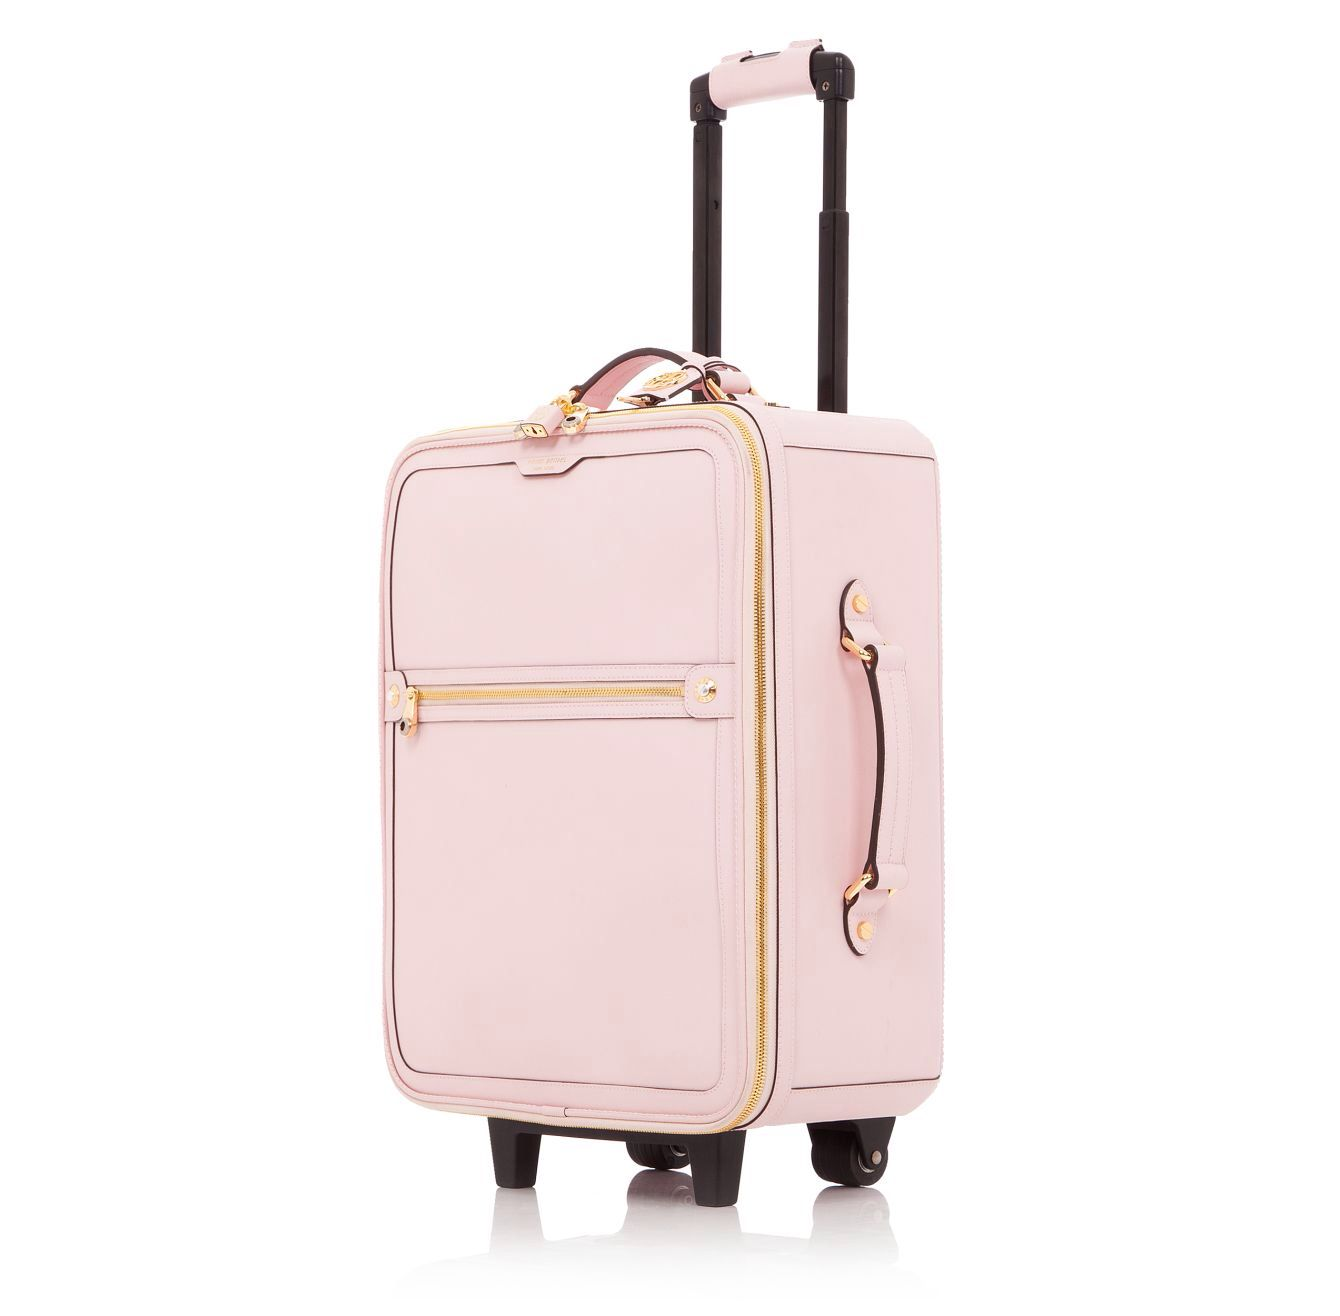 e762143adb0c Faded Pink Henri Bendel Luggage